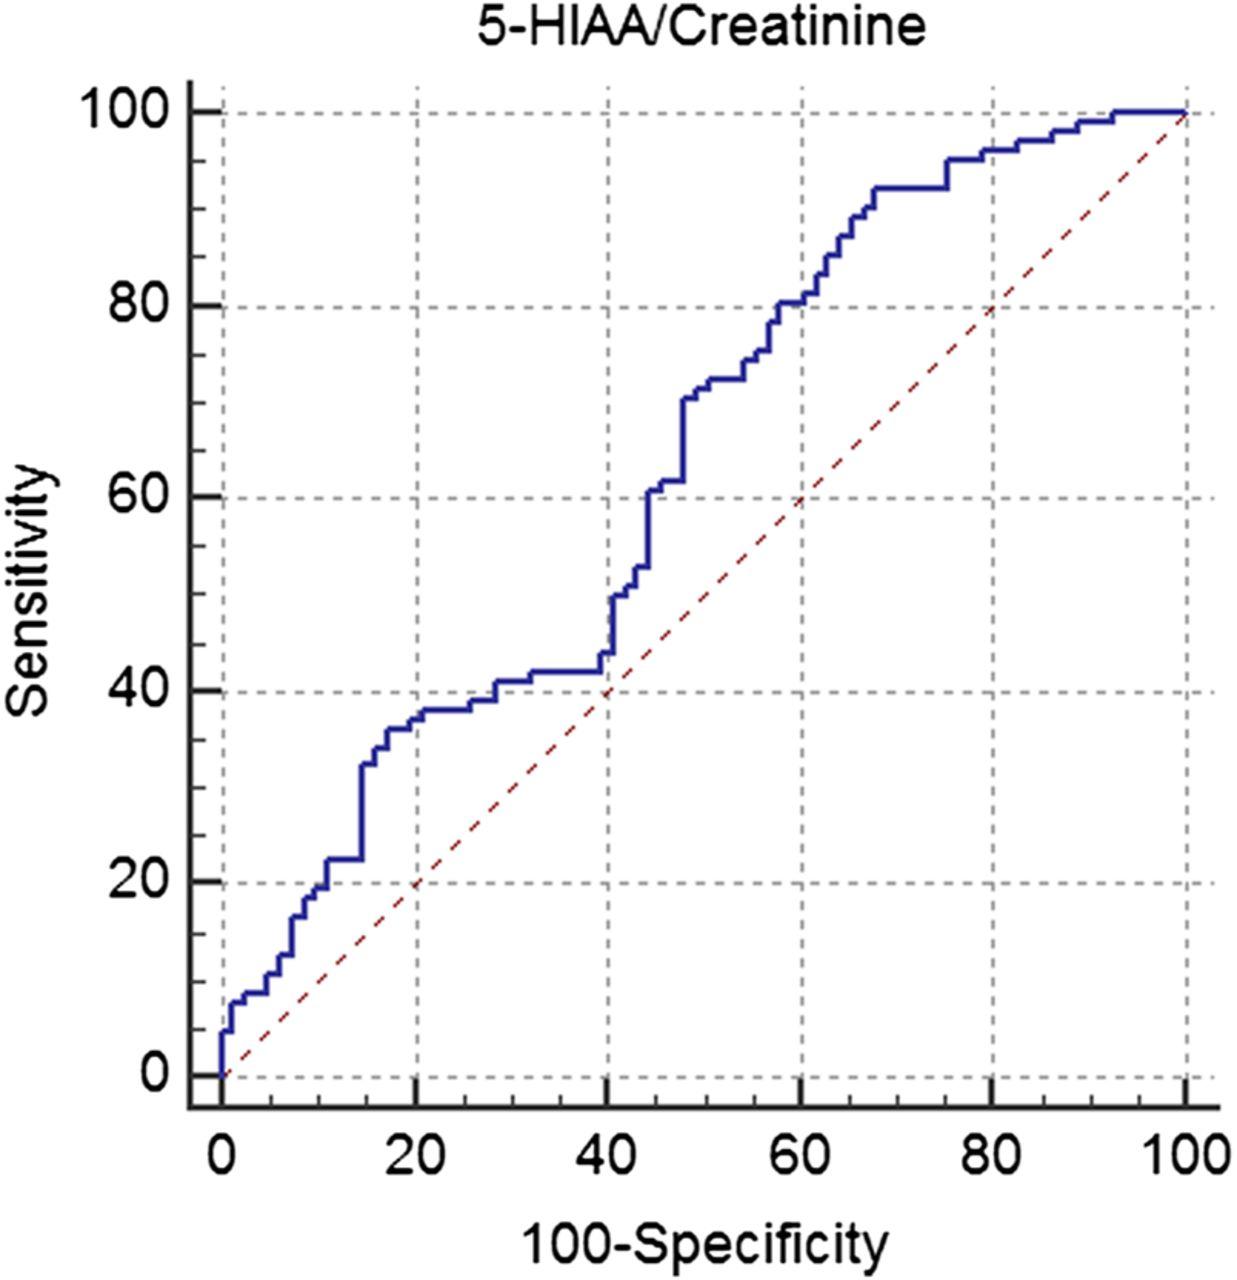 Does elevated urinary 5-hydroxyindole acetic acid level